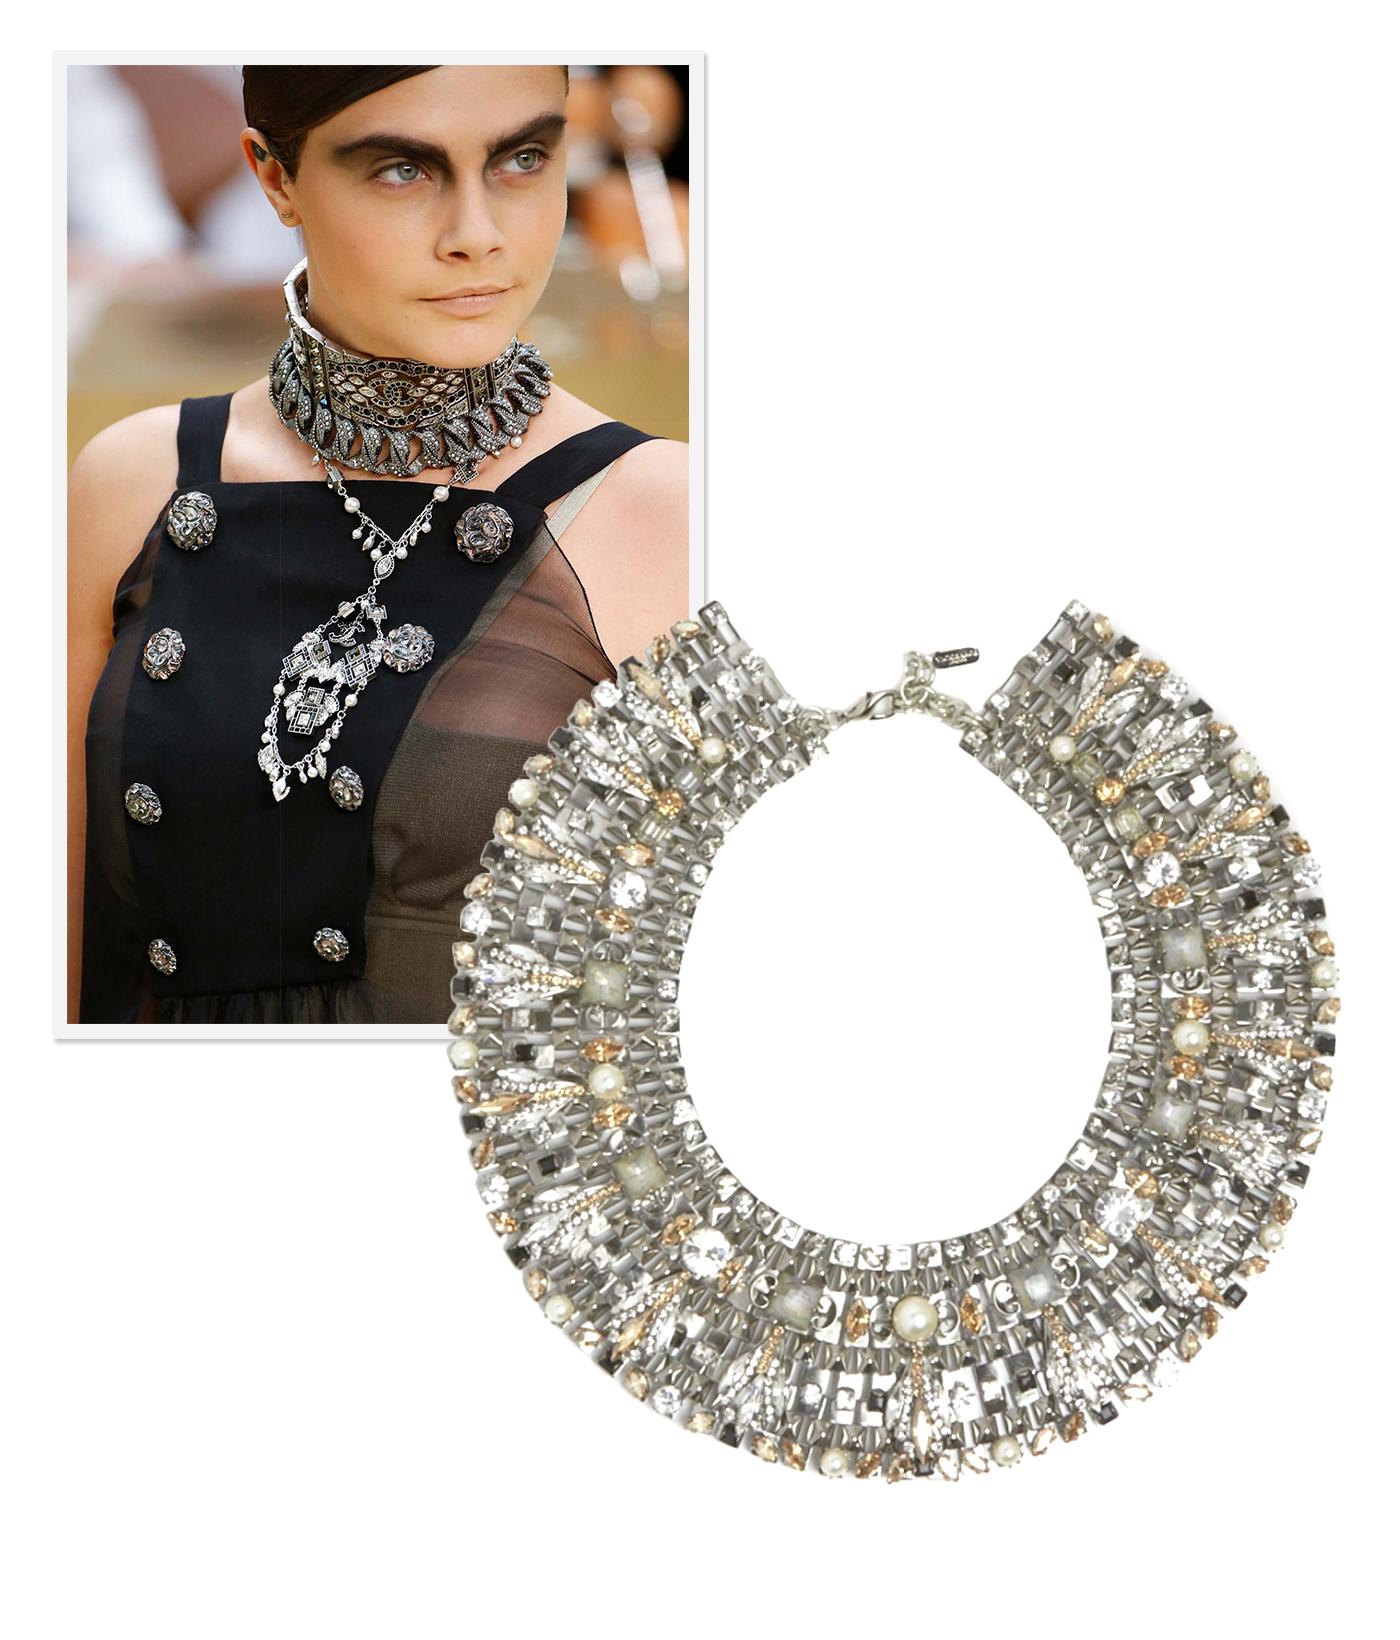 jewelry-trends-fall-2015-runway-08.jpg